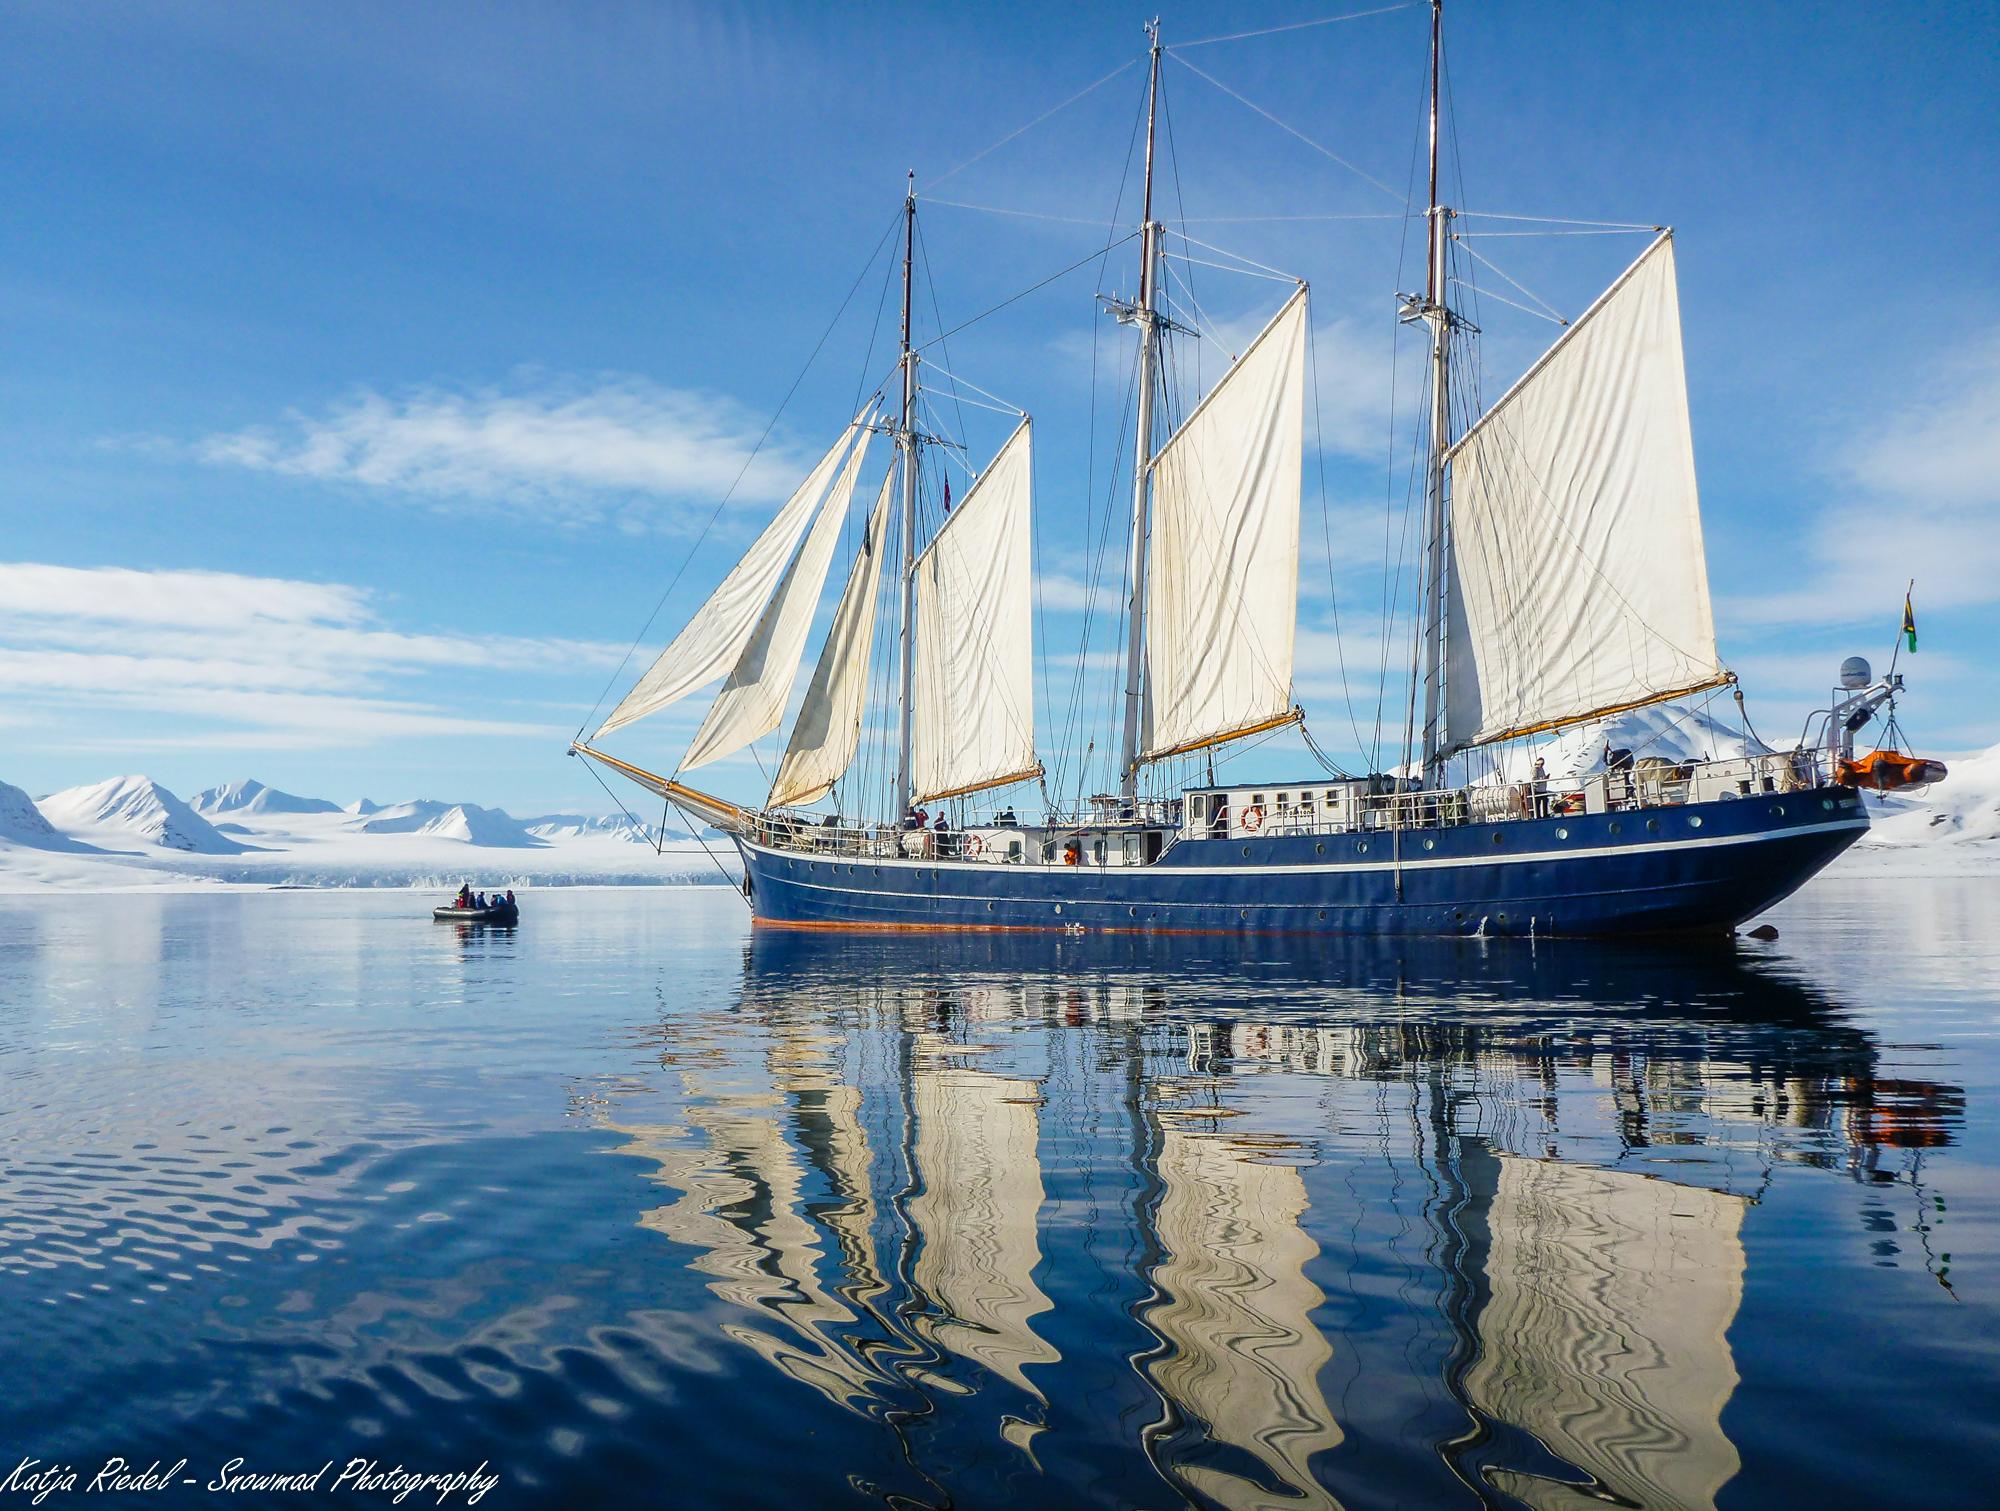 North Spitsbergen, ArcticSpring, May, Rembrandt van Rijn © Katja riedel-Oceanwide Expeditions.jpg